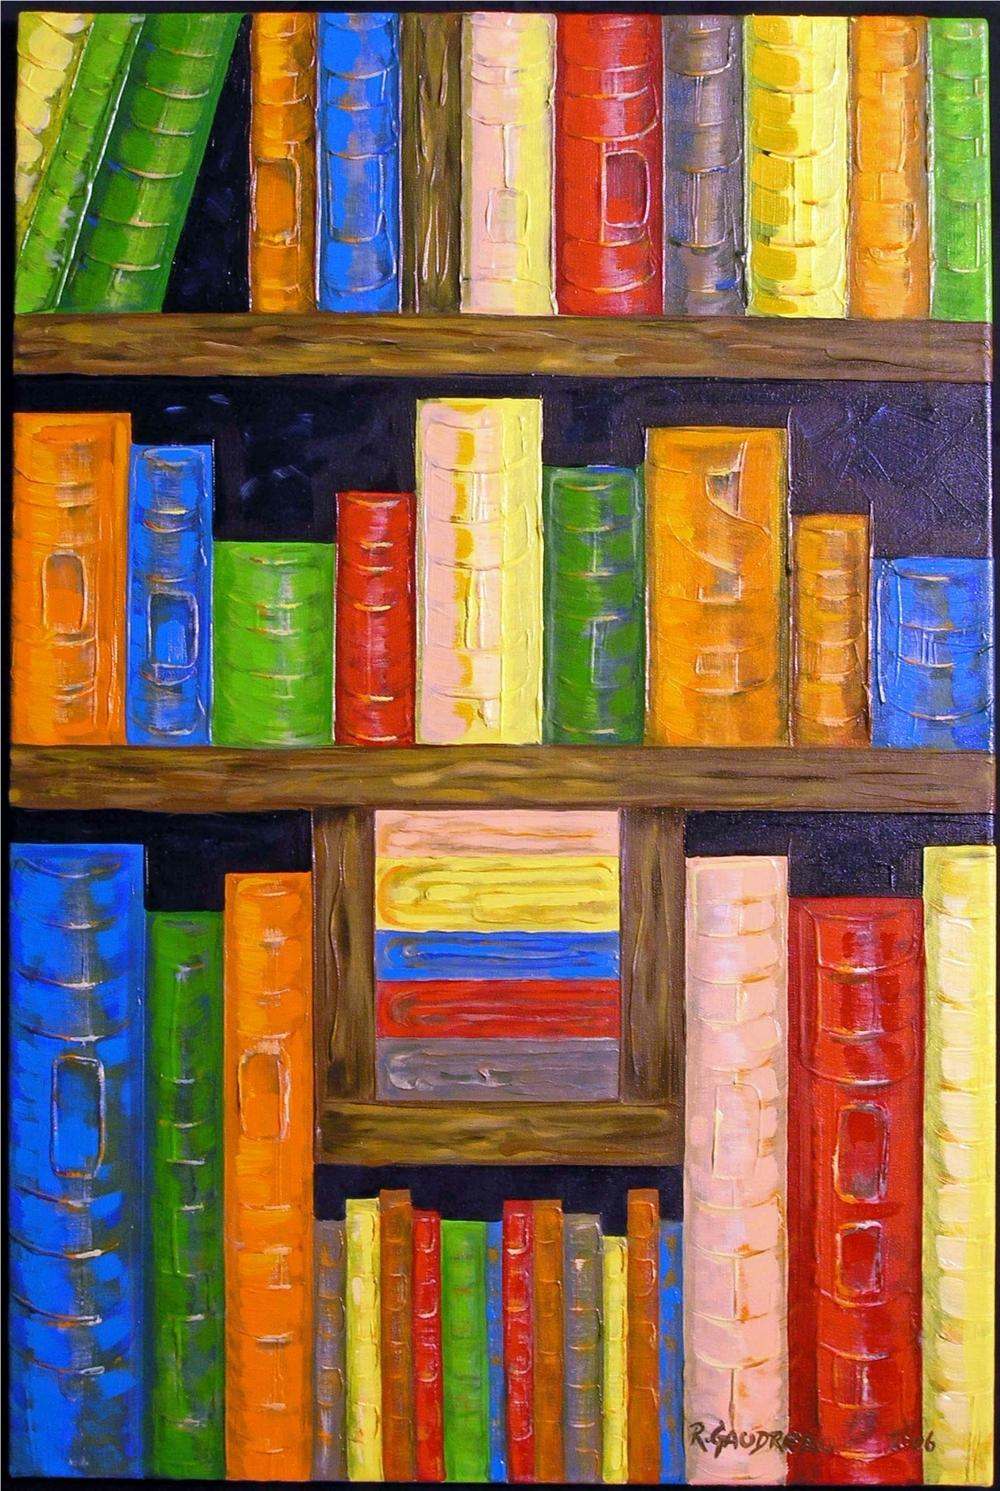 1250 43 Books Max pxl MasterJPG.jpg